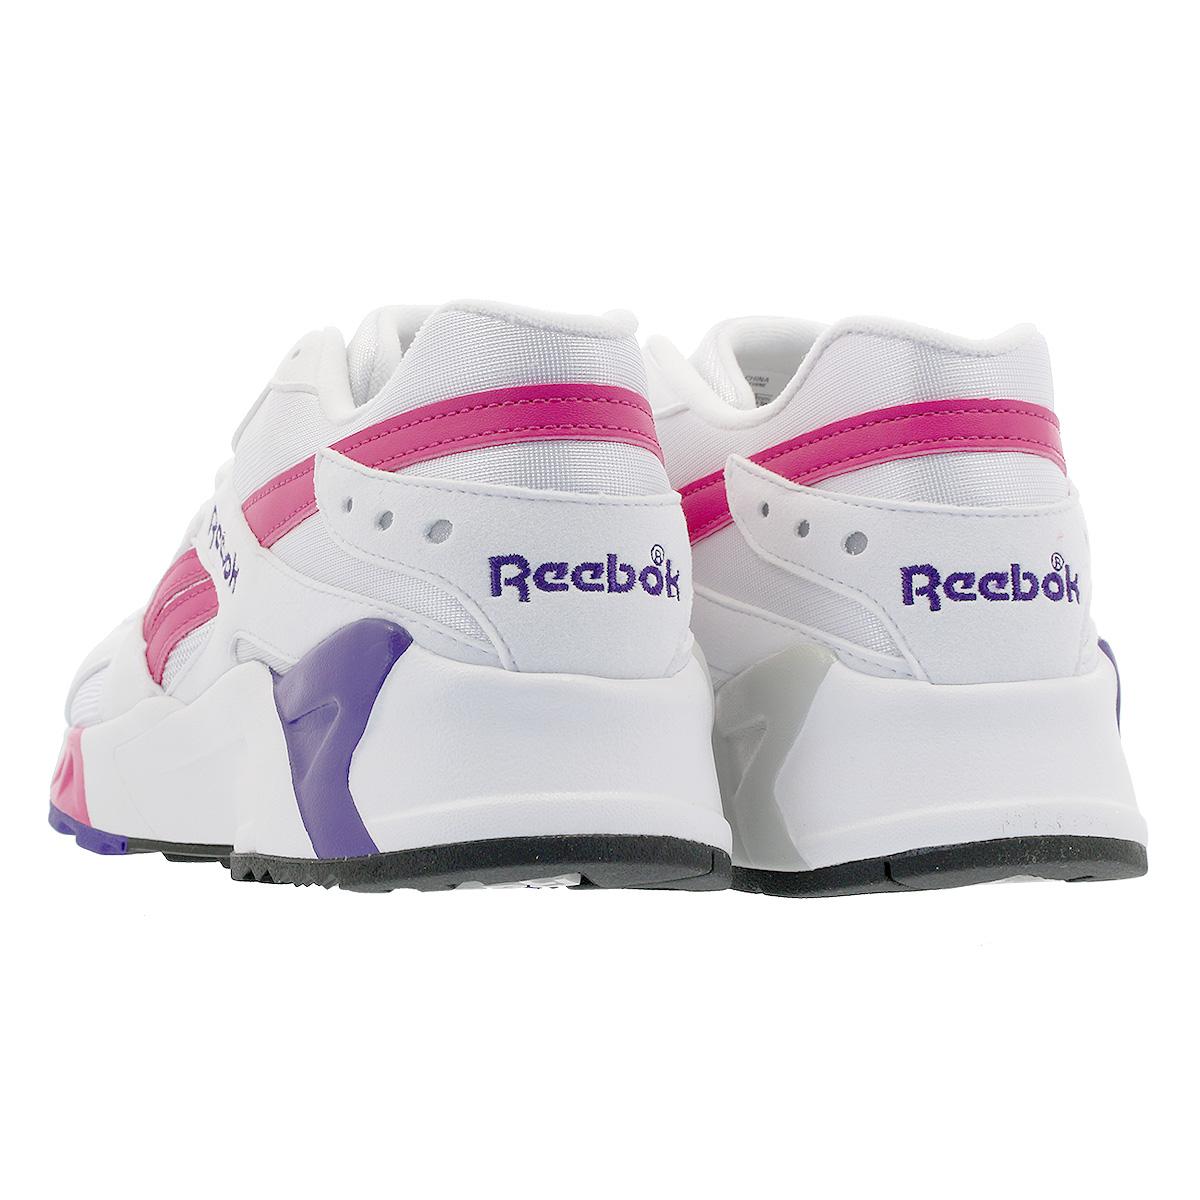 26e65f698631 Reebok AZTREK OG Reebok as trek Aussie WHITE BRIGHT ROSE COBALT PURPLE  cn7841